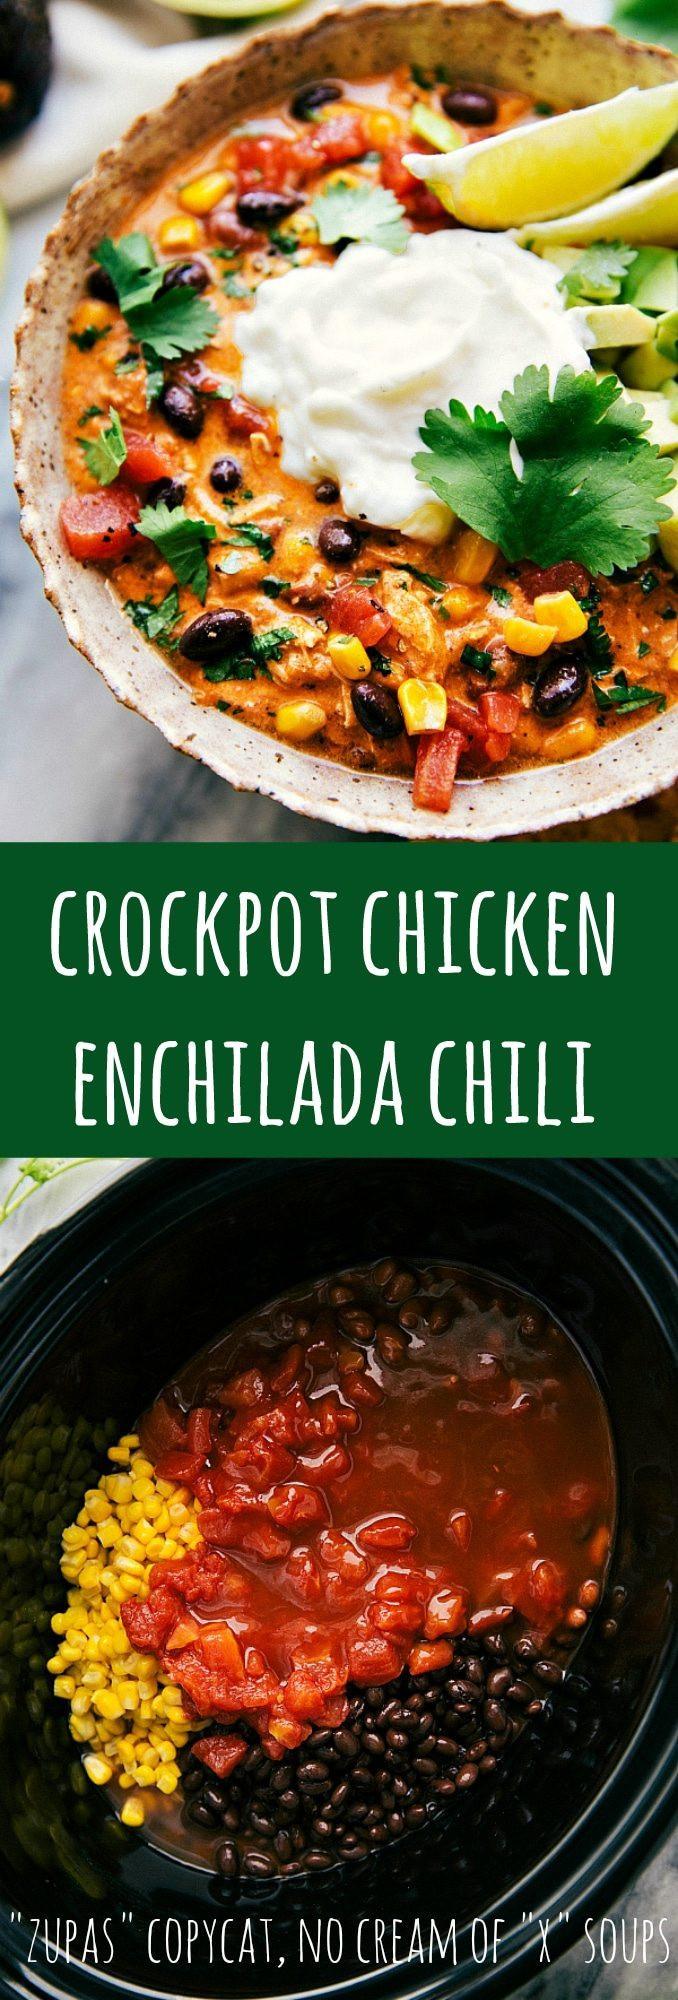 Crockpot Chicken Enchiladas Healthy  Easy Crockpot Creamy Chicken Enchilada Chili